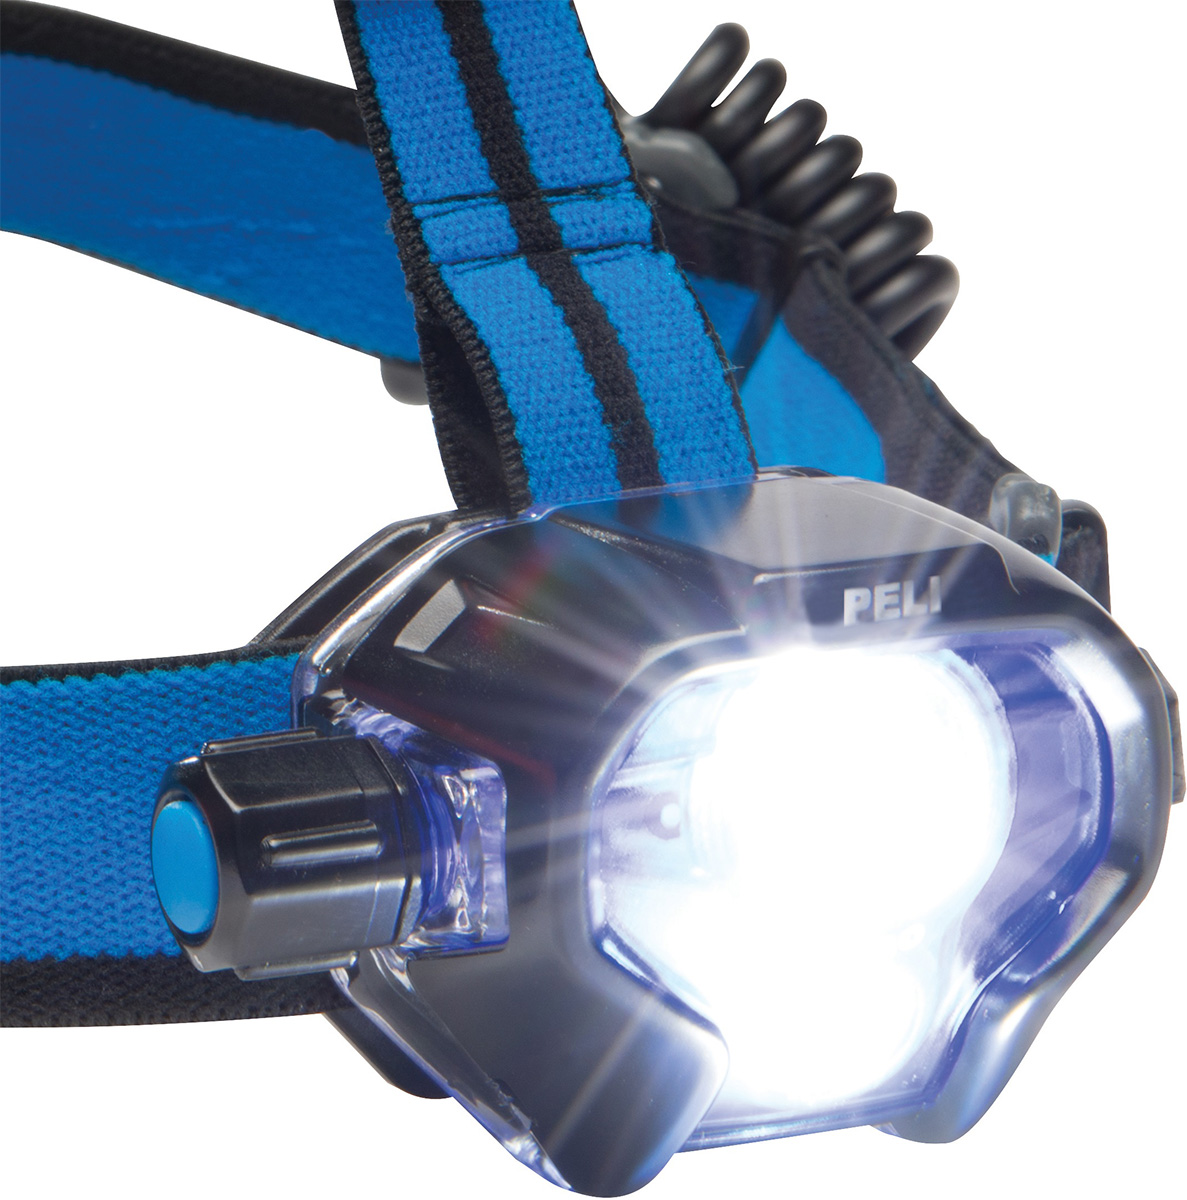 peli 2780r rechargeable super bright led headlamp